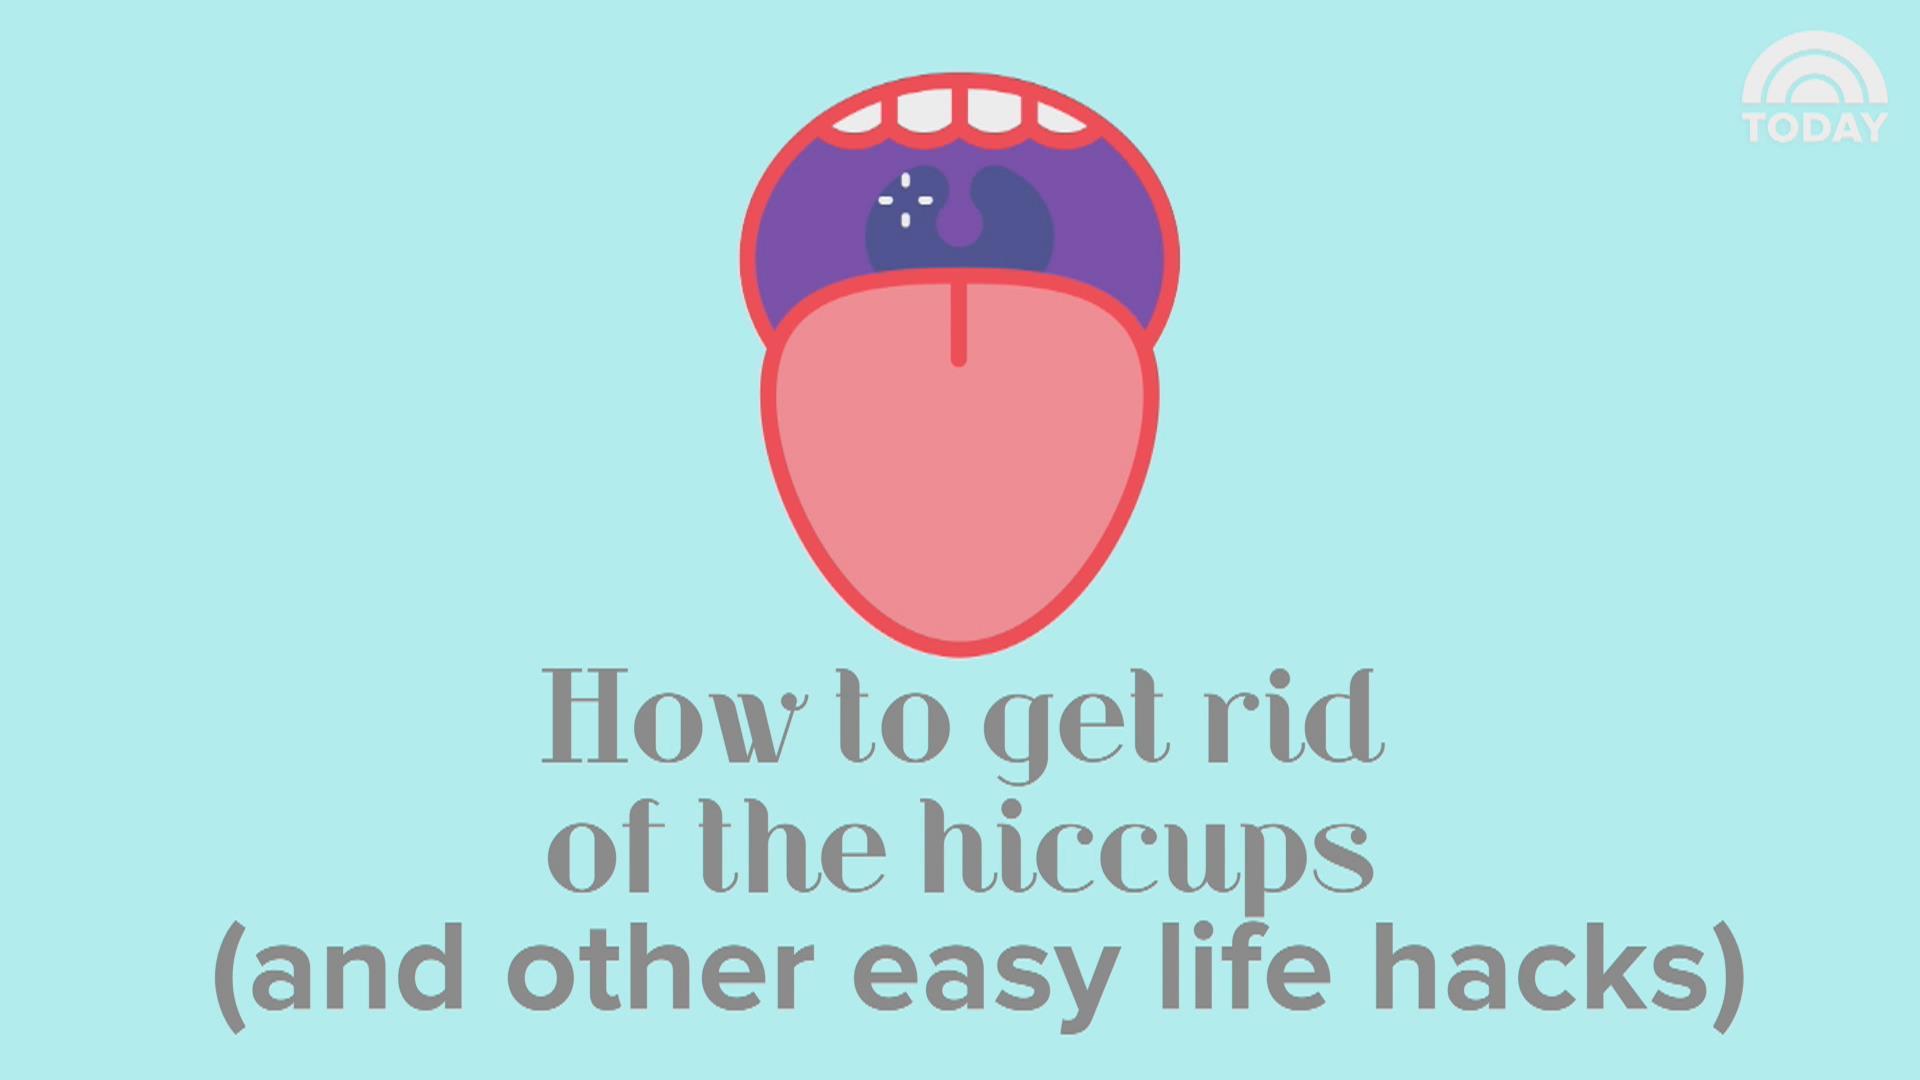 How to get rid of hiccups - How To Get Rid Of Hiccups 24